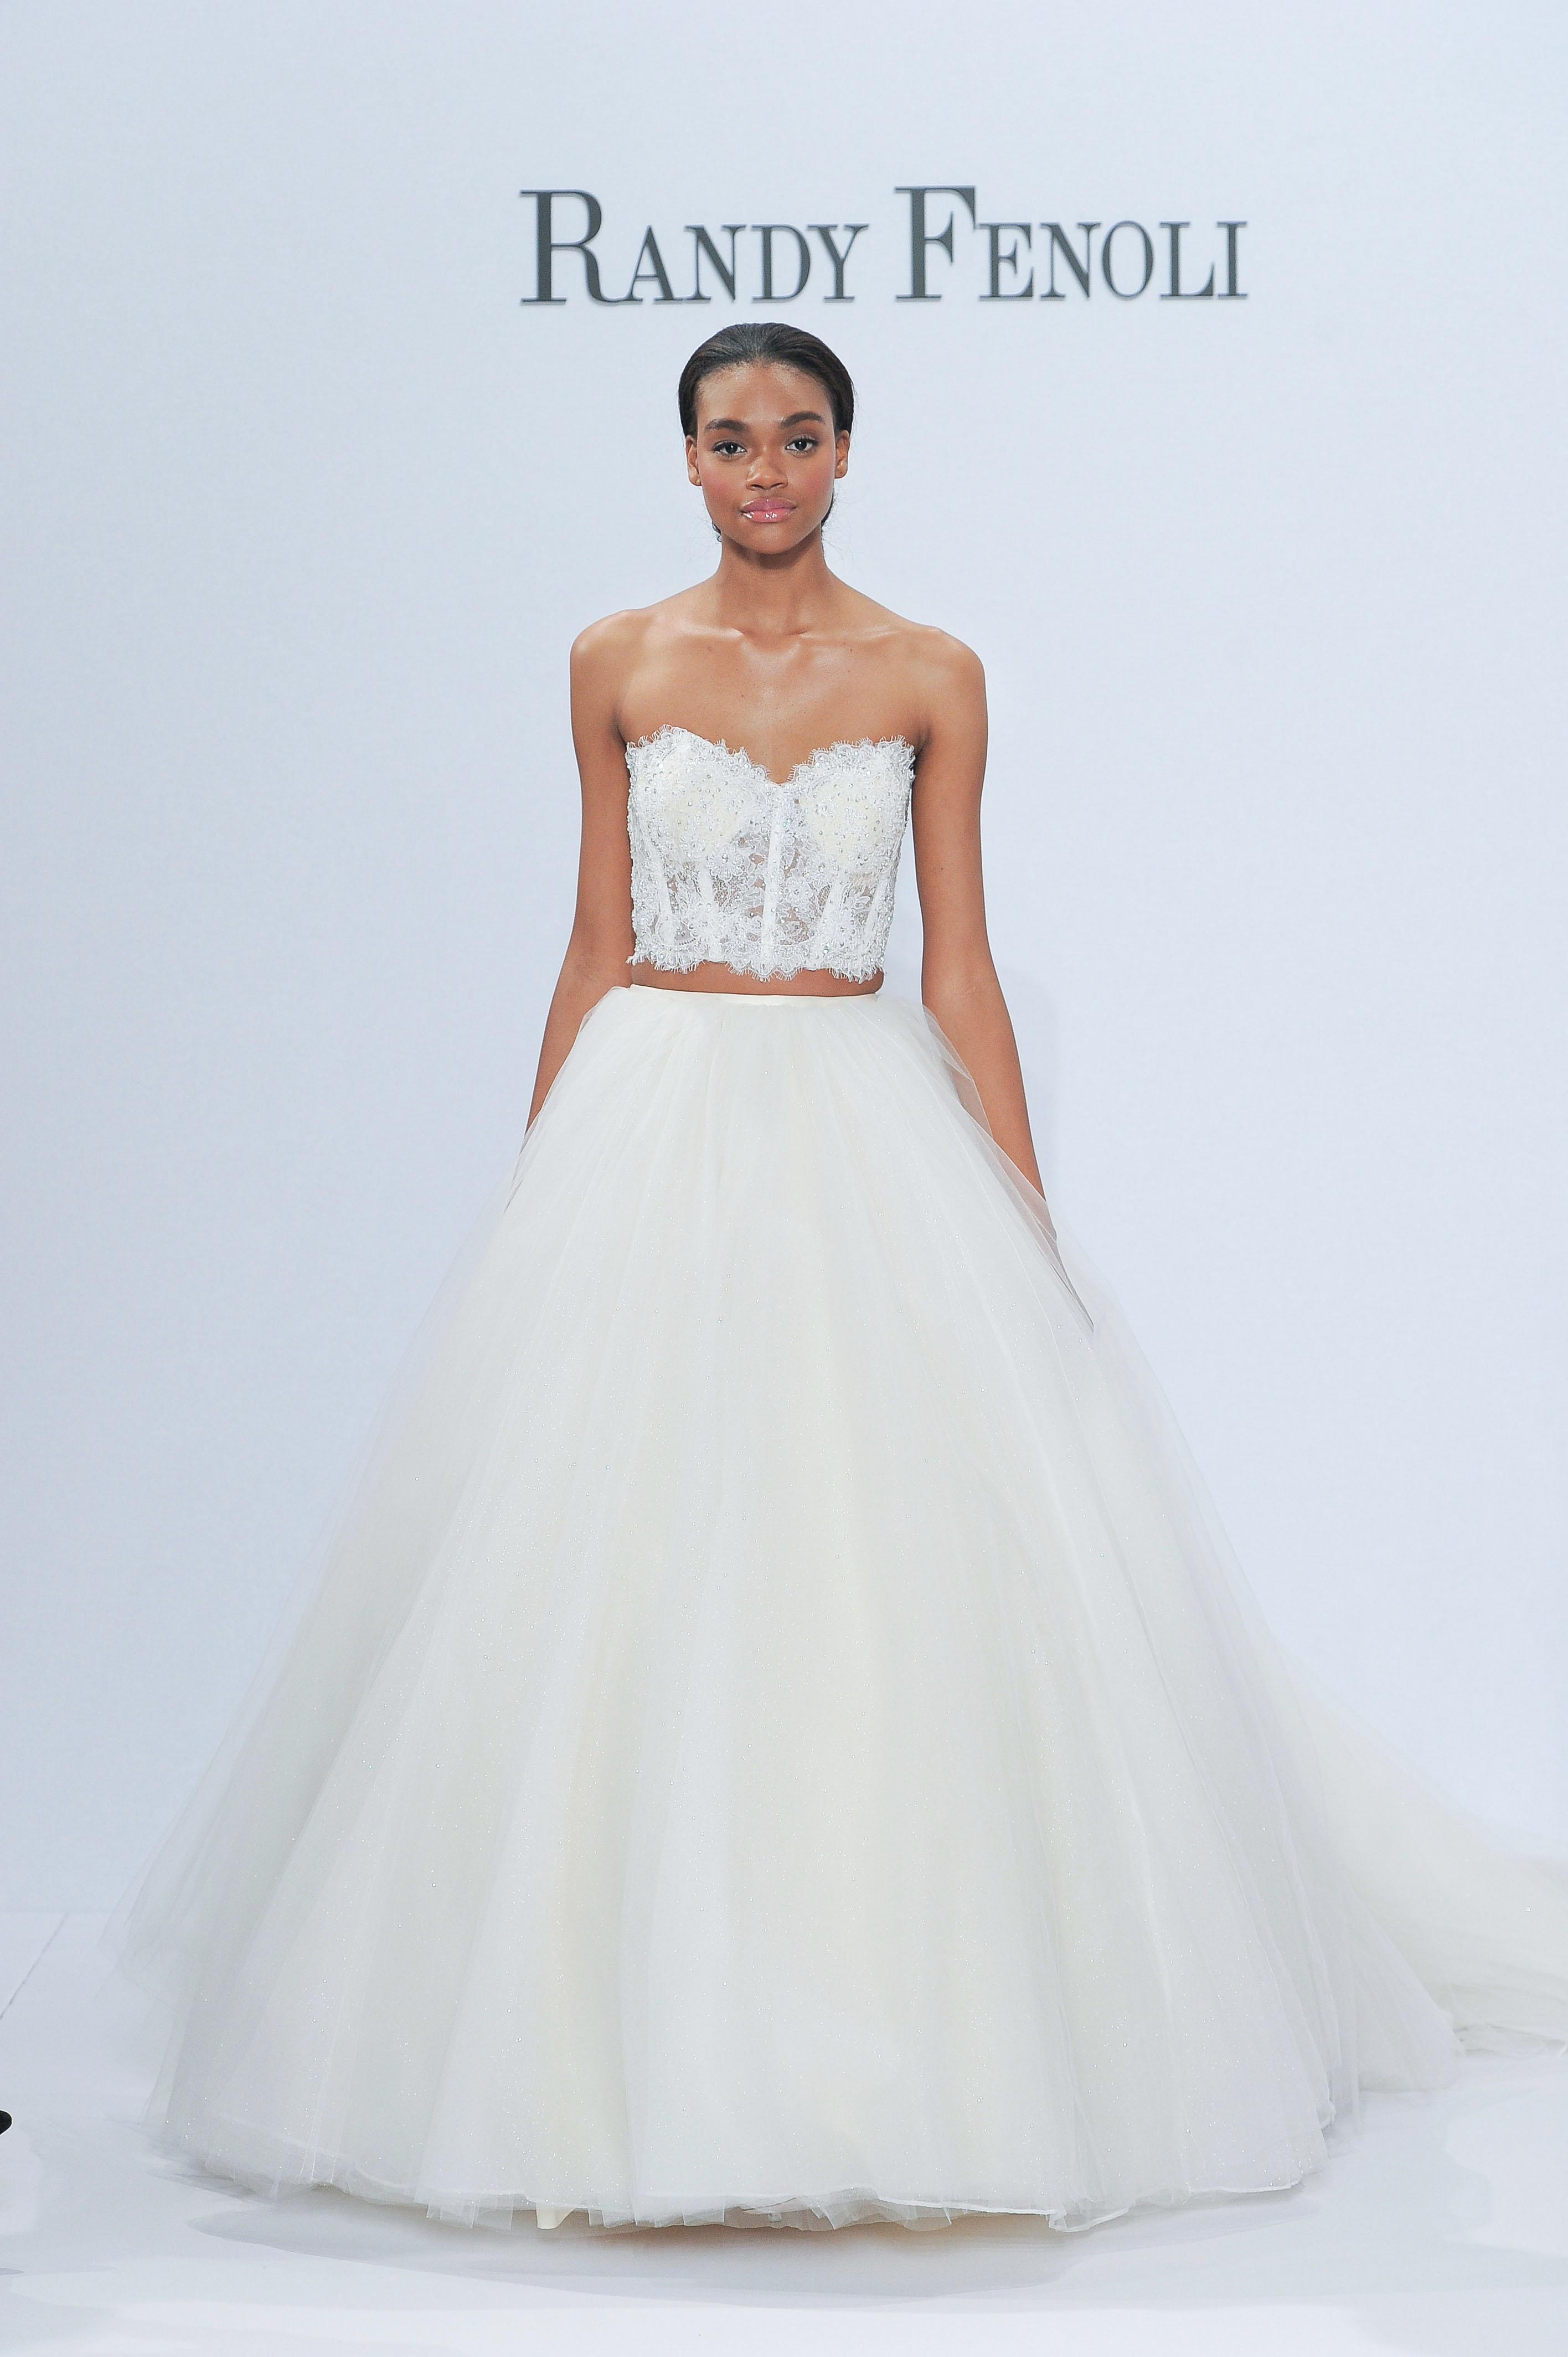 randy fenoli tan bare midriff wedding dress spring 2018